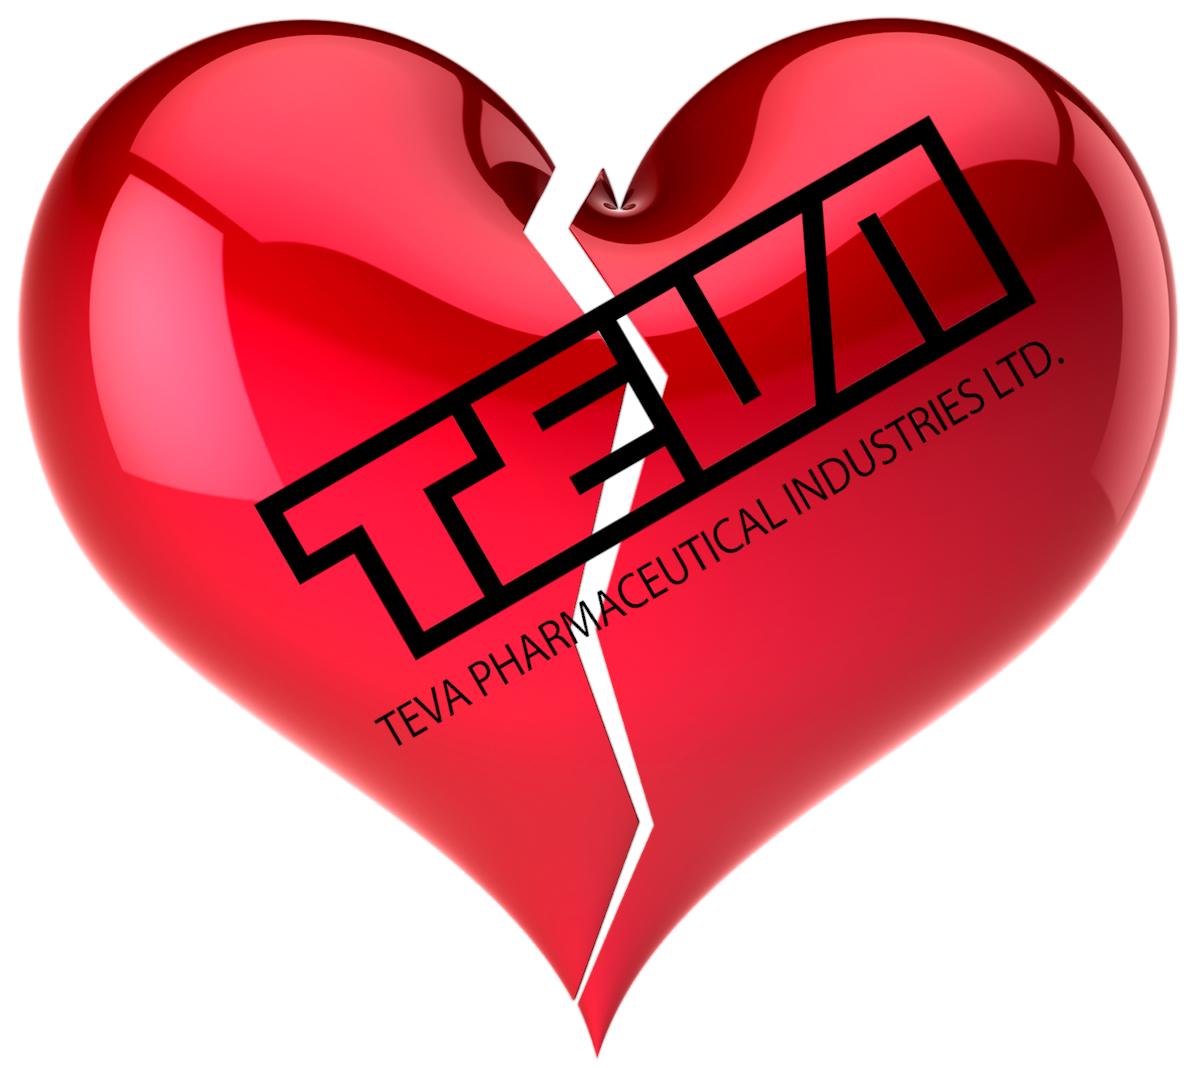 Am I Next? 7,000 jobs cut at Teva Pharmaceuticals.